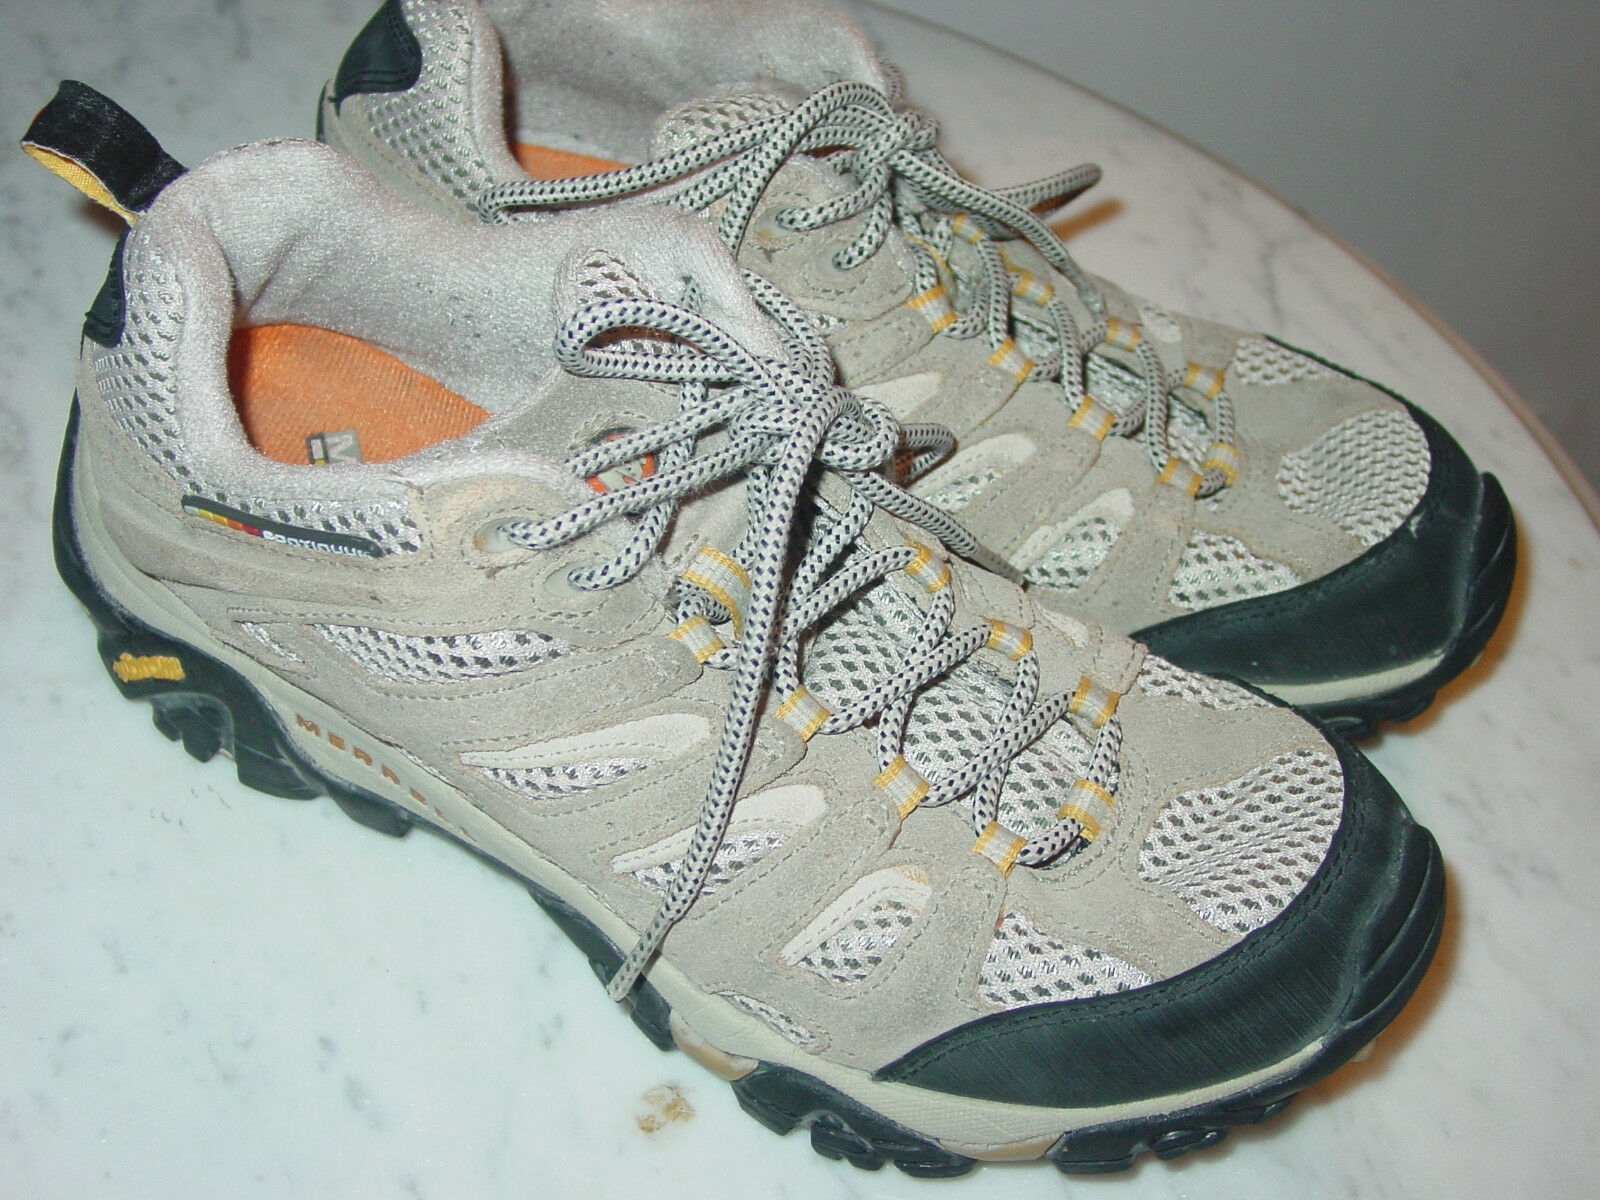 Damenschuhe Merrell Moab Ventilator Taupe J86612 Trail/Hiking Schuhes  Größe 9.5 120.00